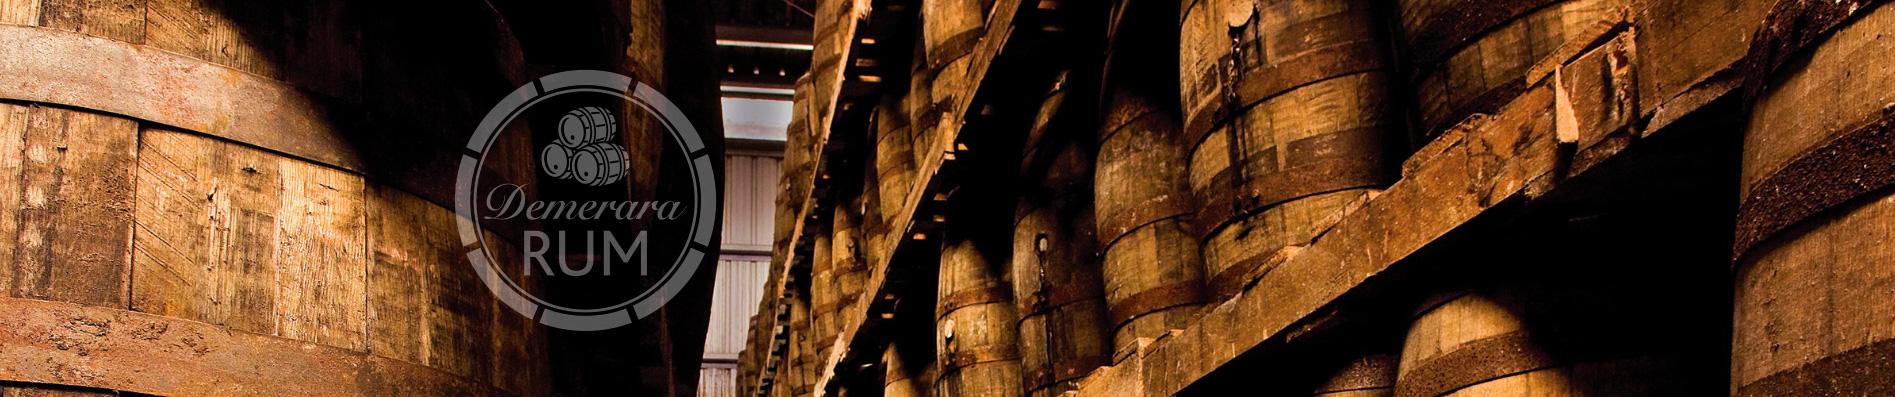 Rum a sudy s rumem